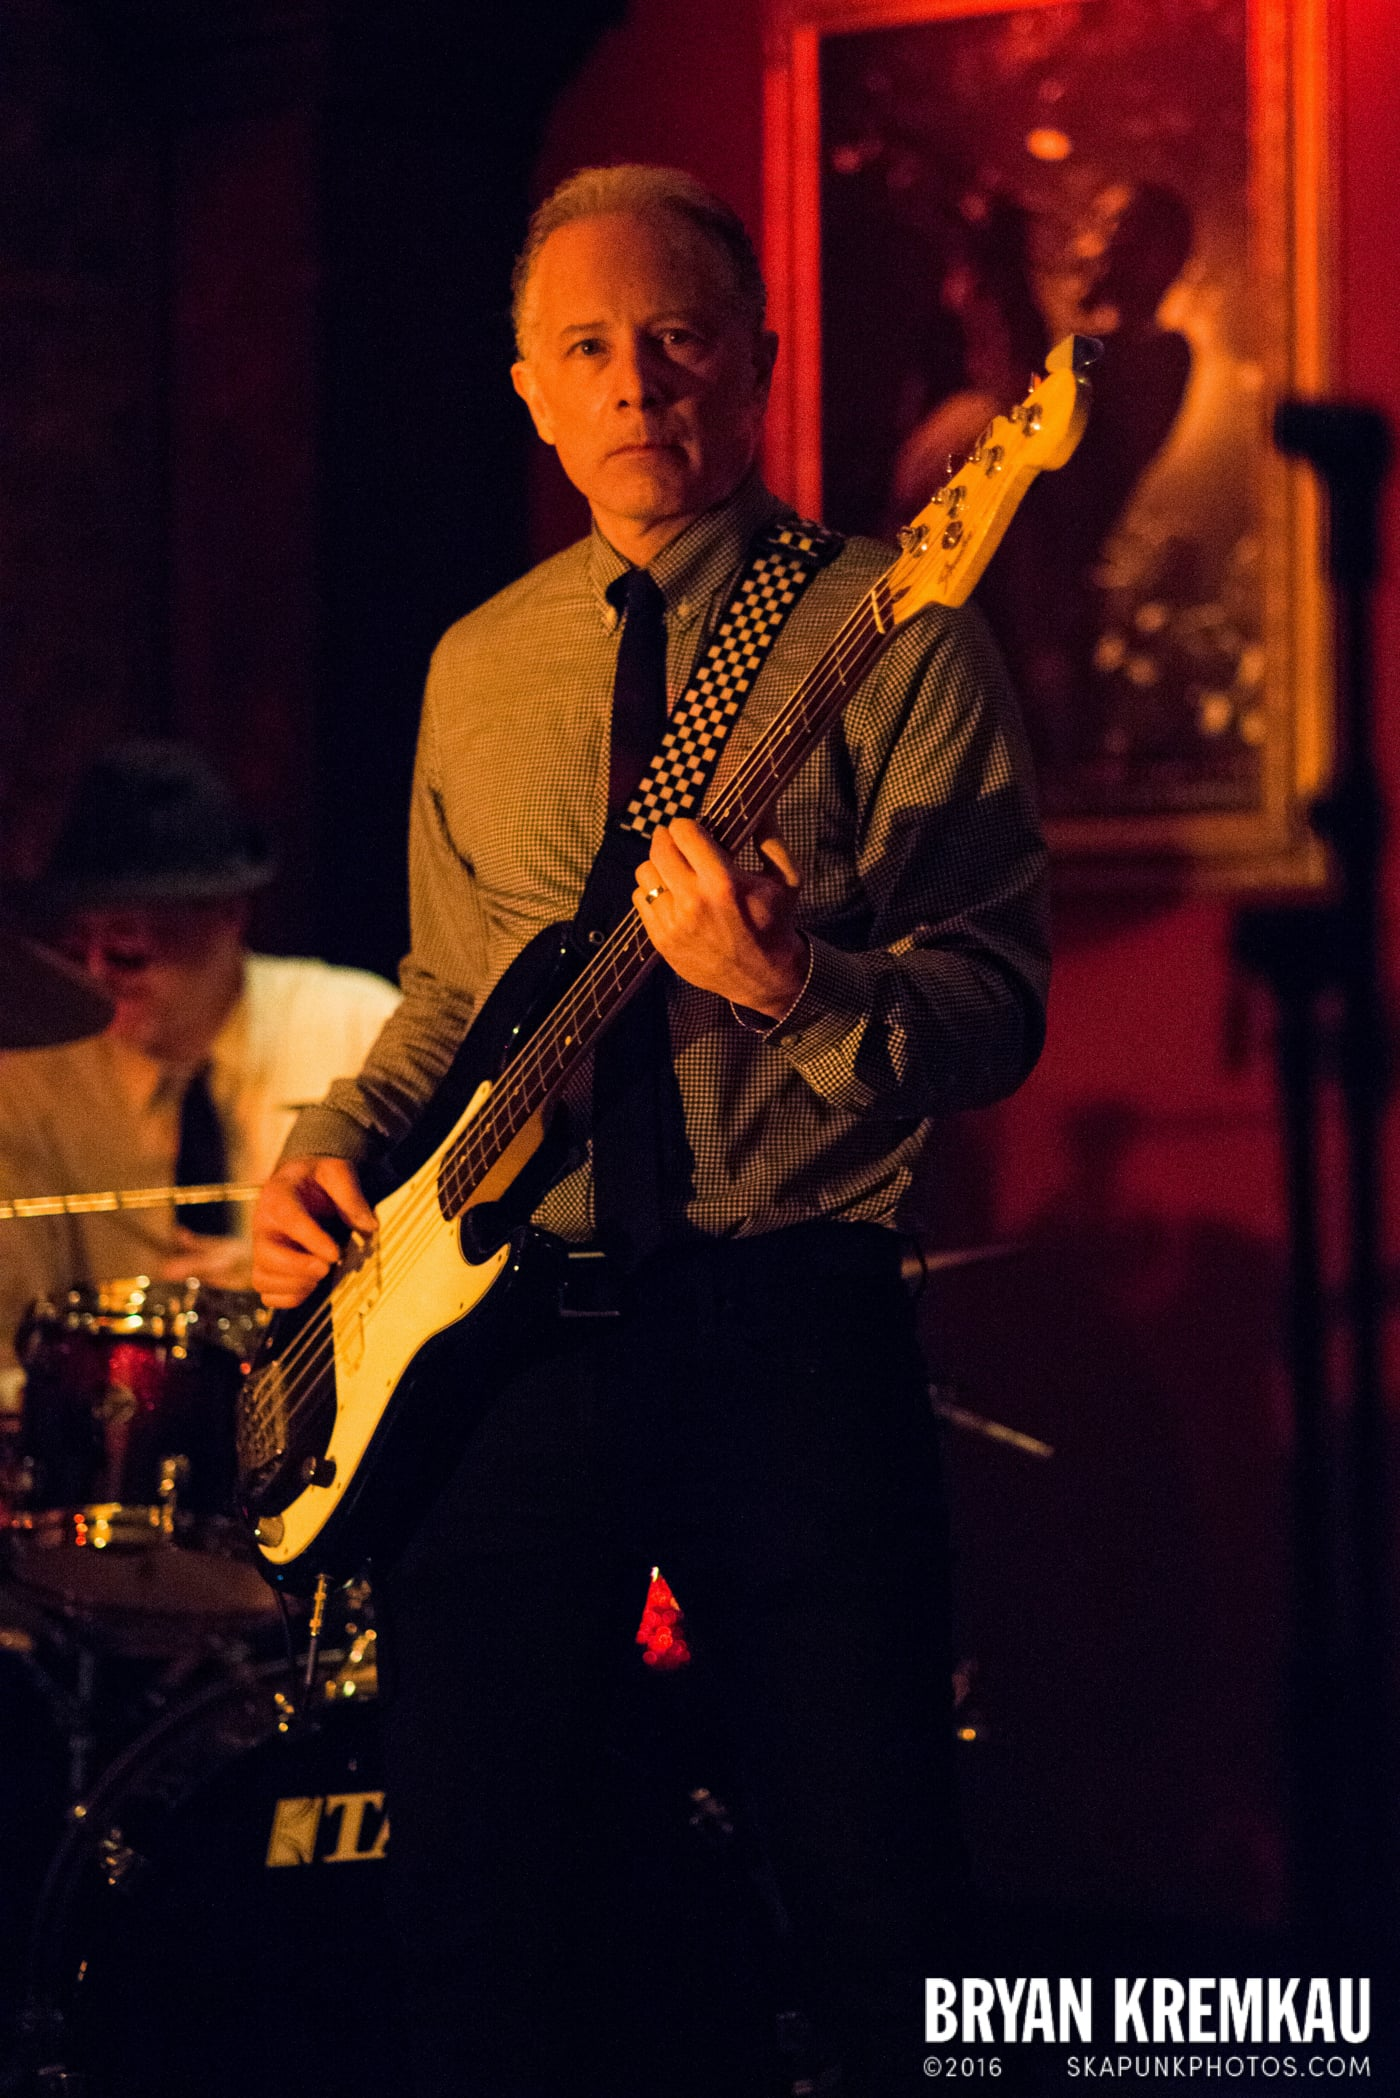 Rude Boy George @ Characters, NYC - 11.16.13 (3)